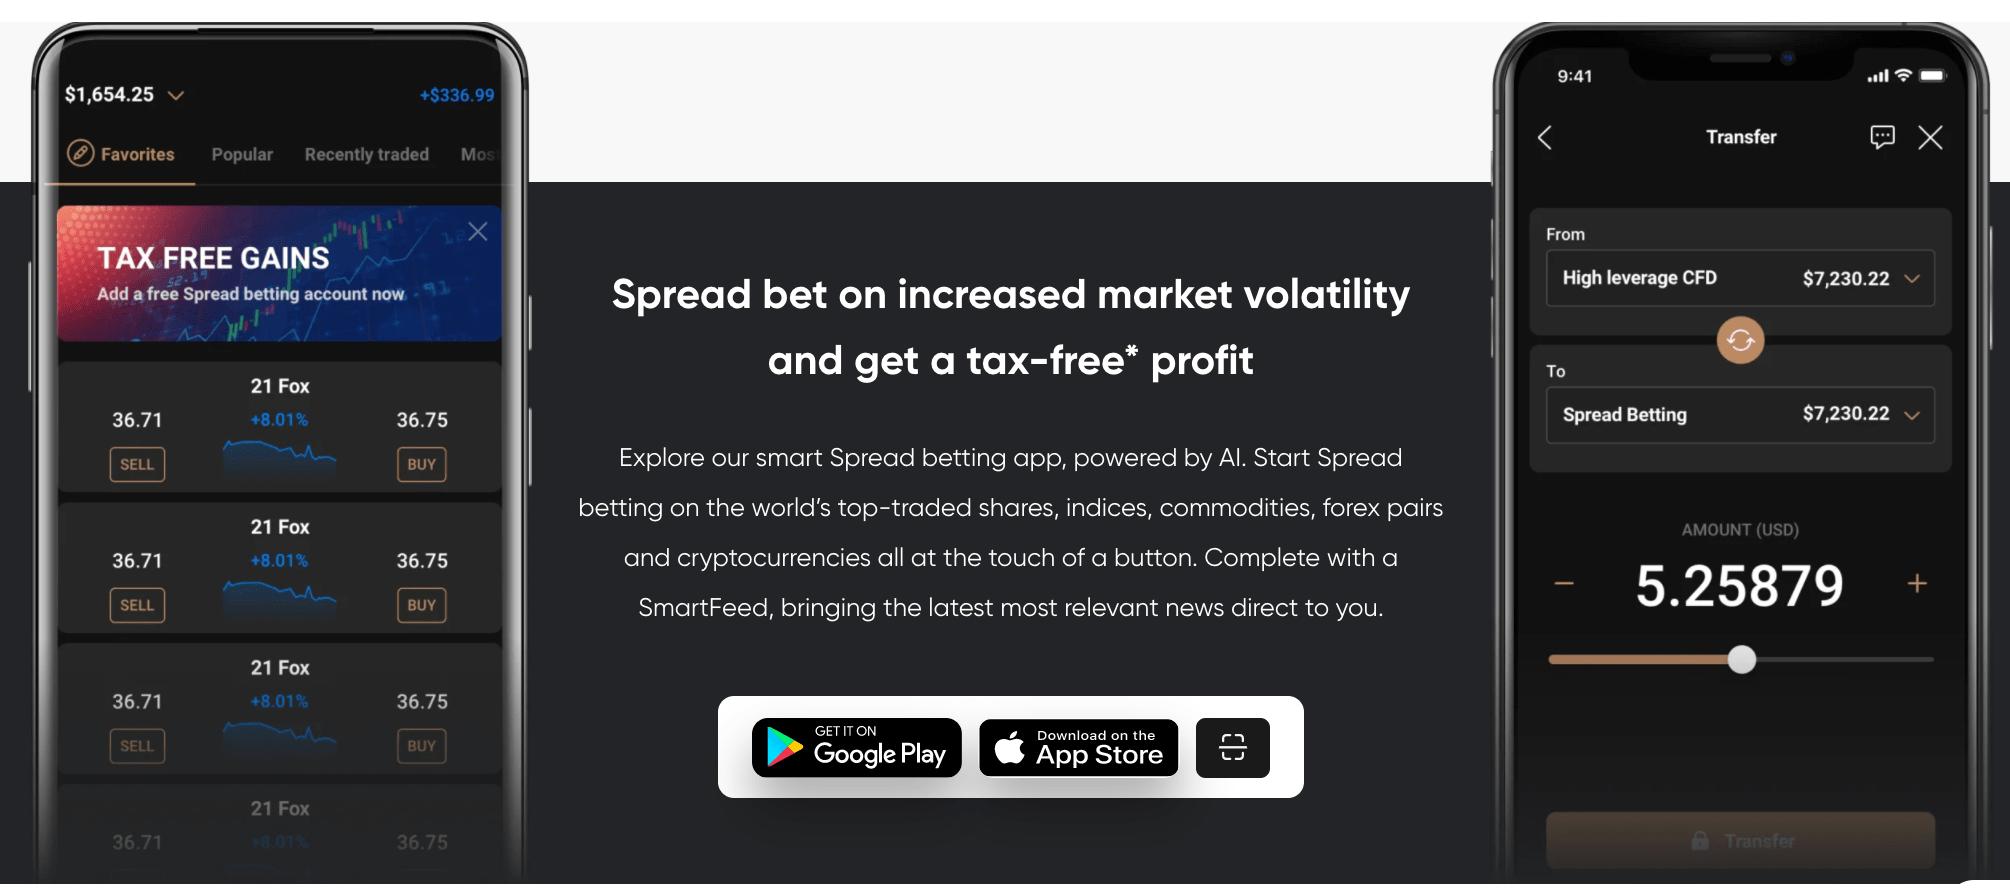 capital.com spread betting app